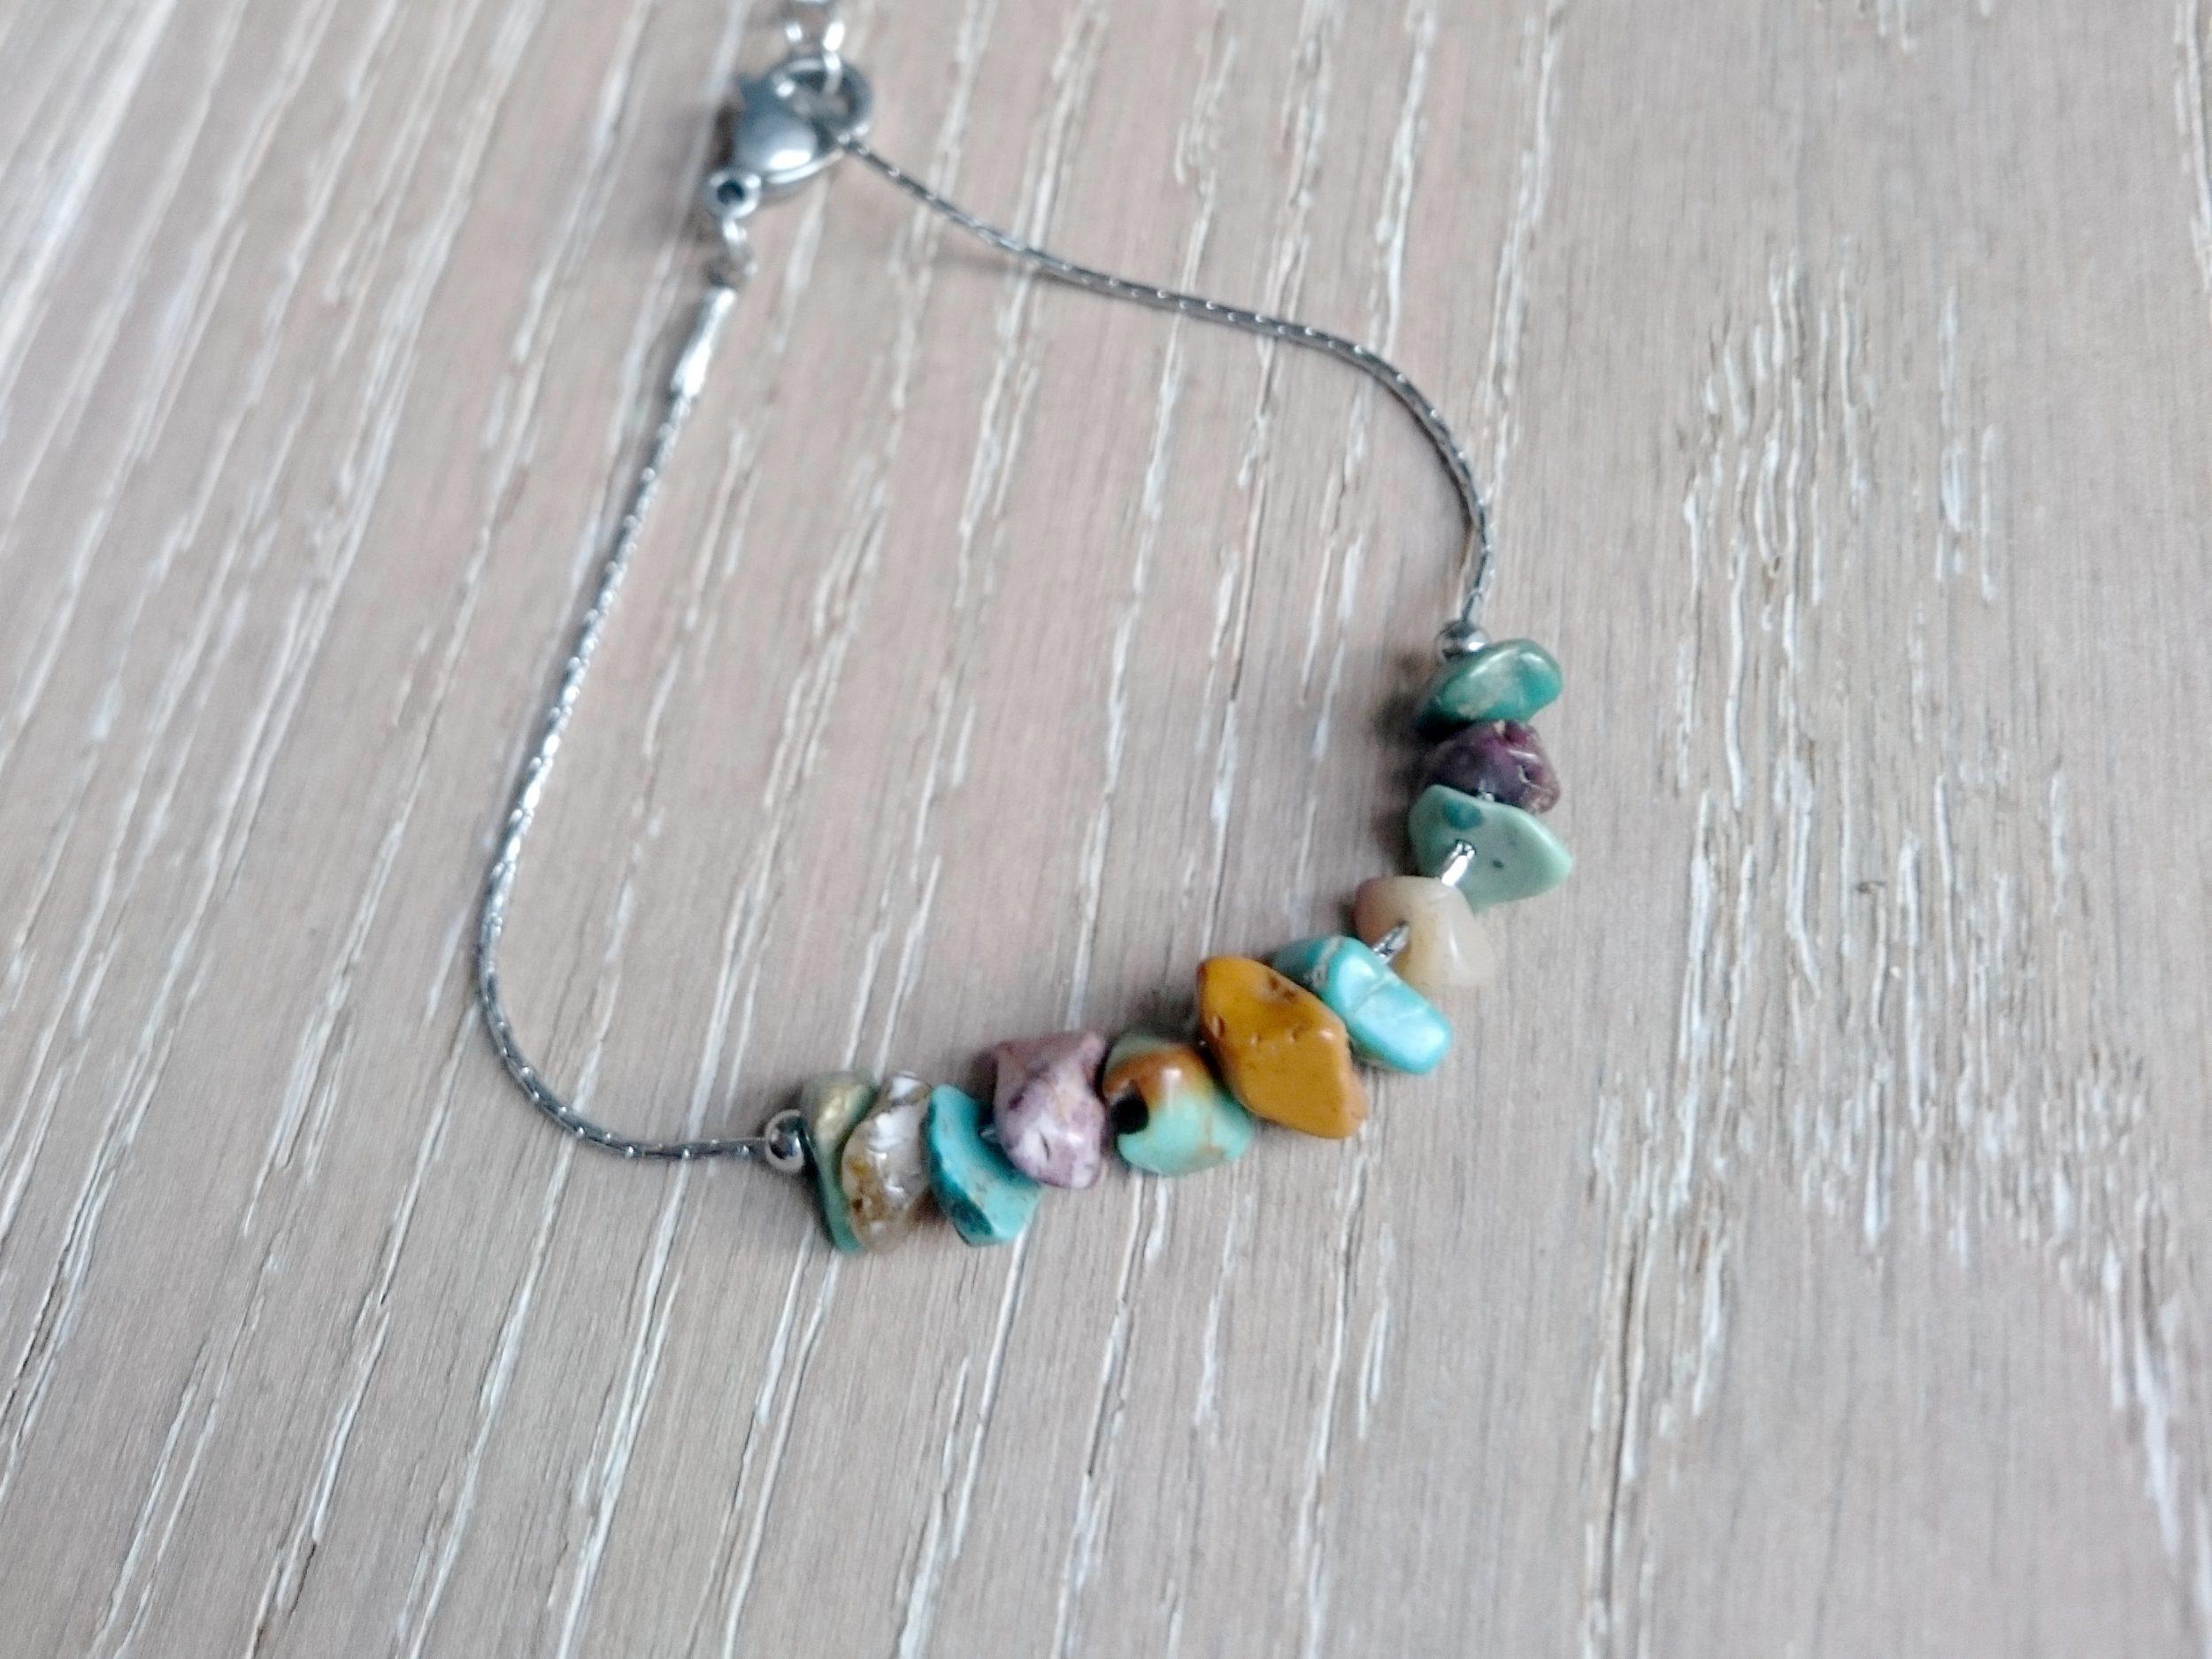 Bracelet chaîne en inox et perles de pierres turquoise et jaspe